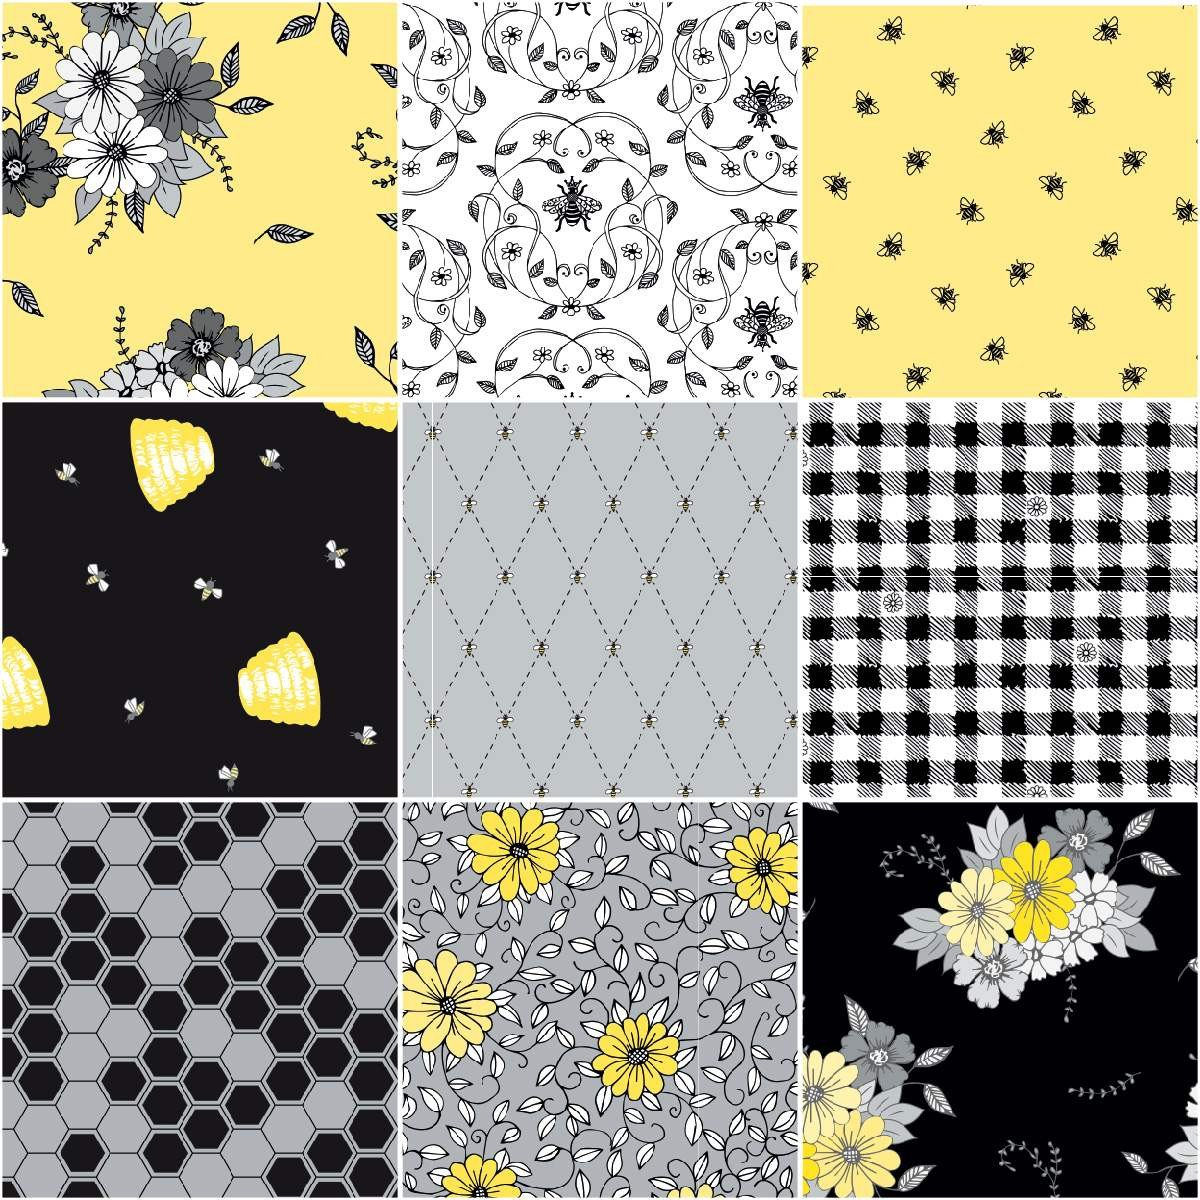 Honey Run by Jill Finley  black with yellow hives(bottom row far right)